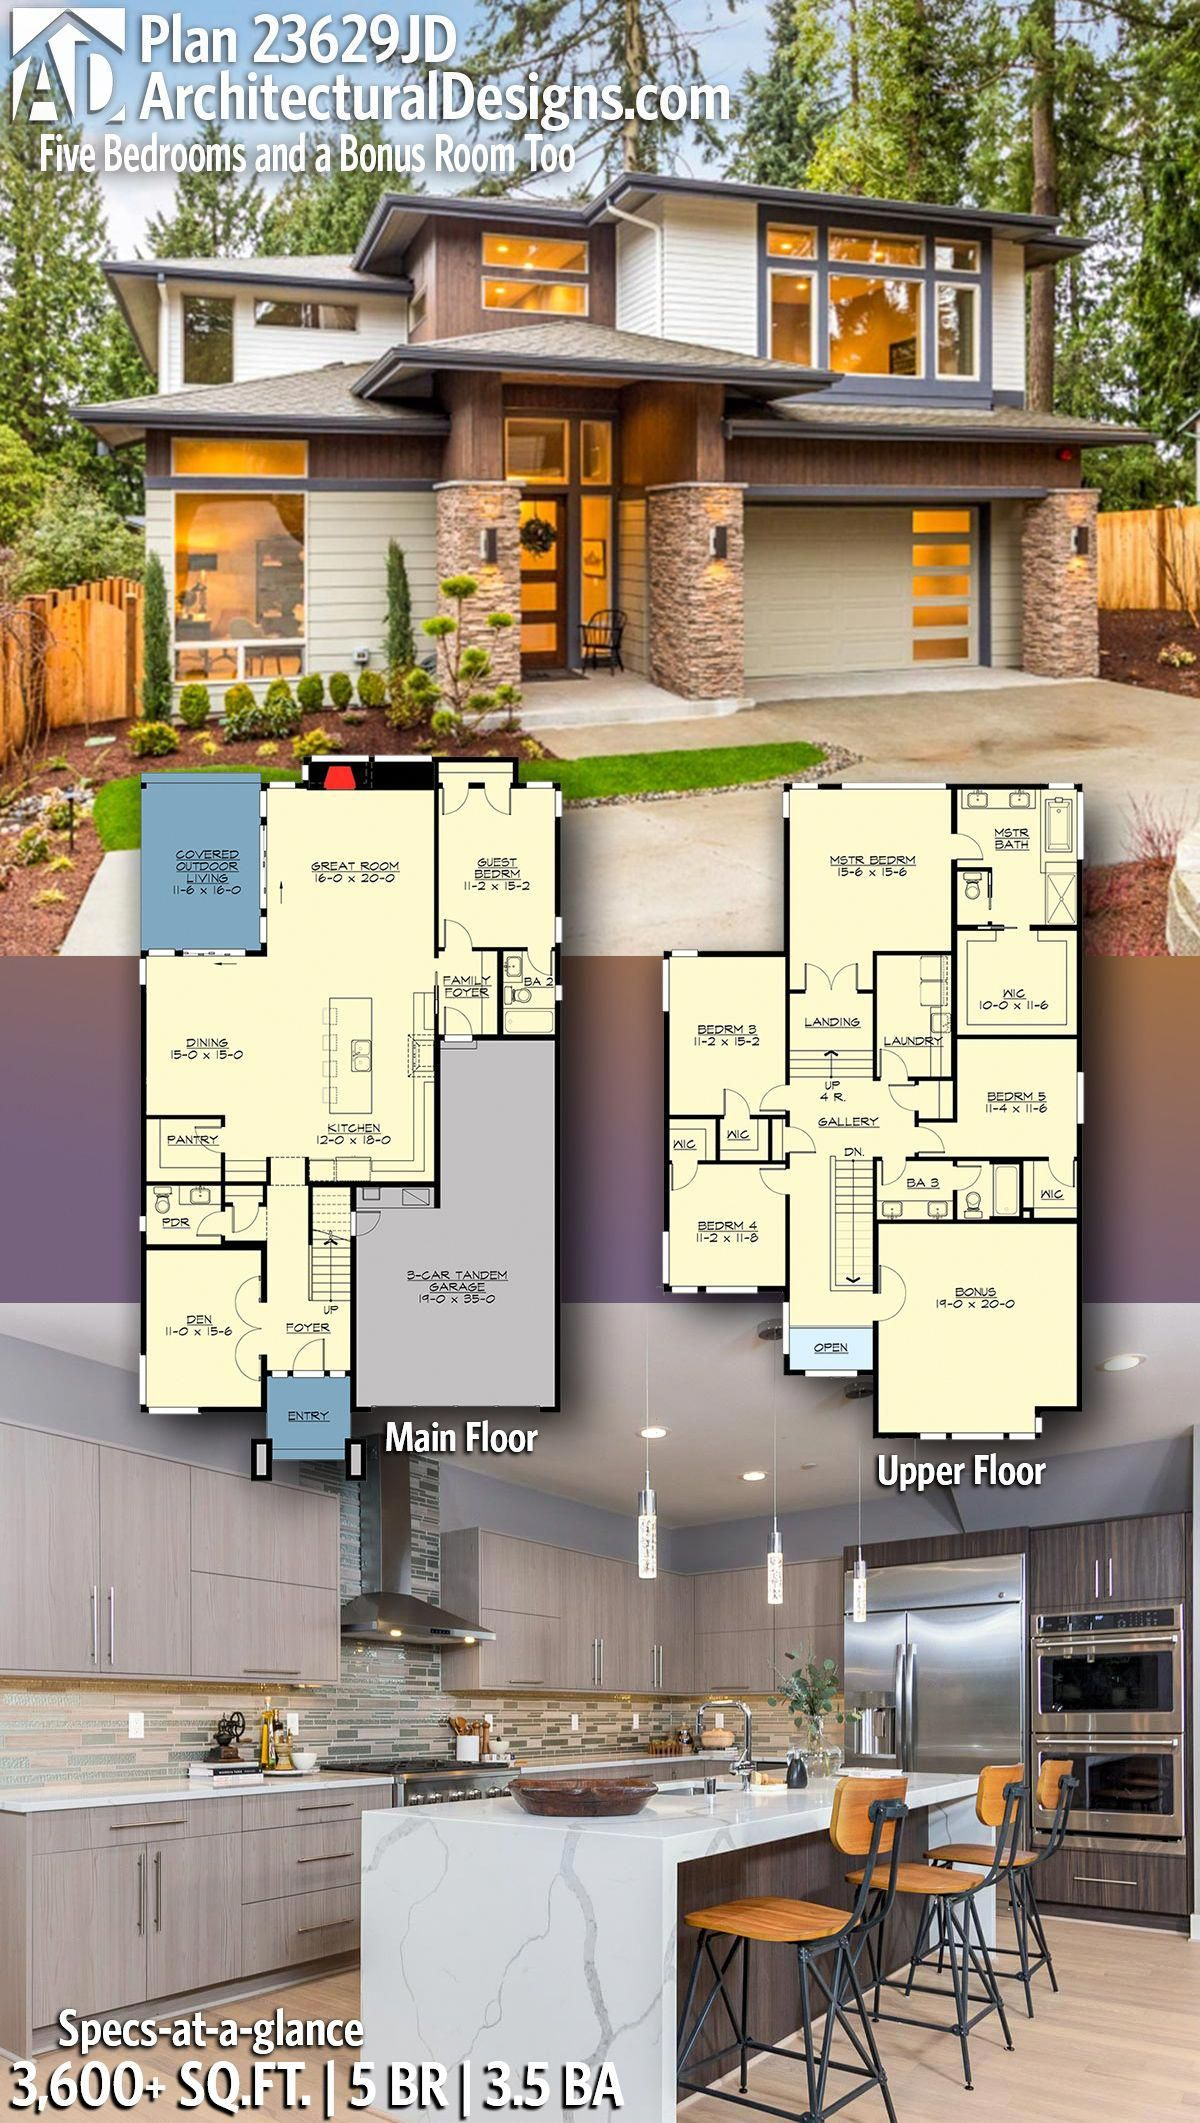 Architectural Designs House Plan 23629jd 5 Br 3 5 Ba 3 600 Sq Ft Ready When Yo Architectural Design House Plans Mansion Floor Plan Modern House Plans